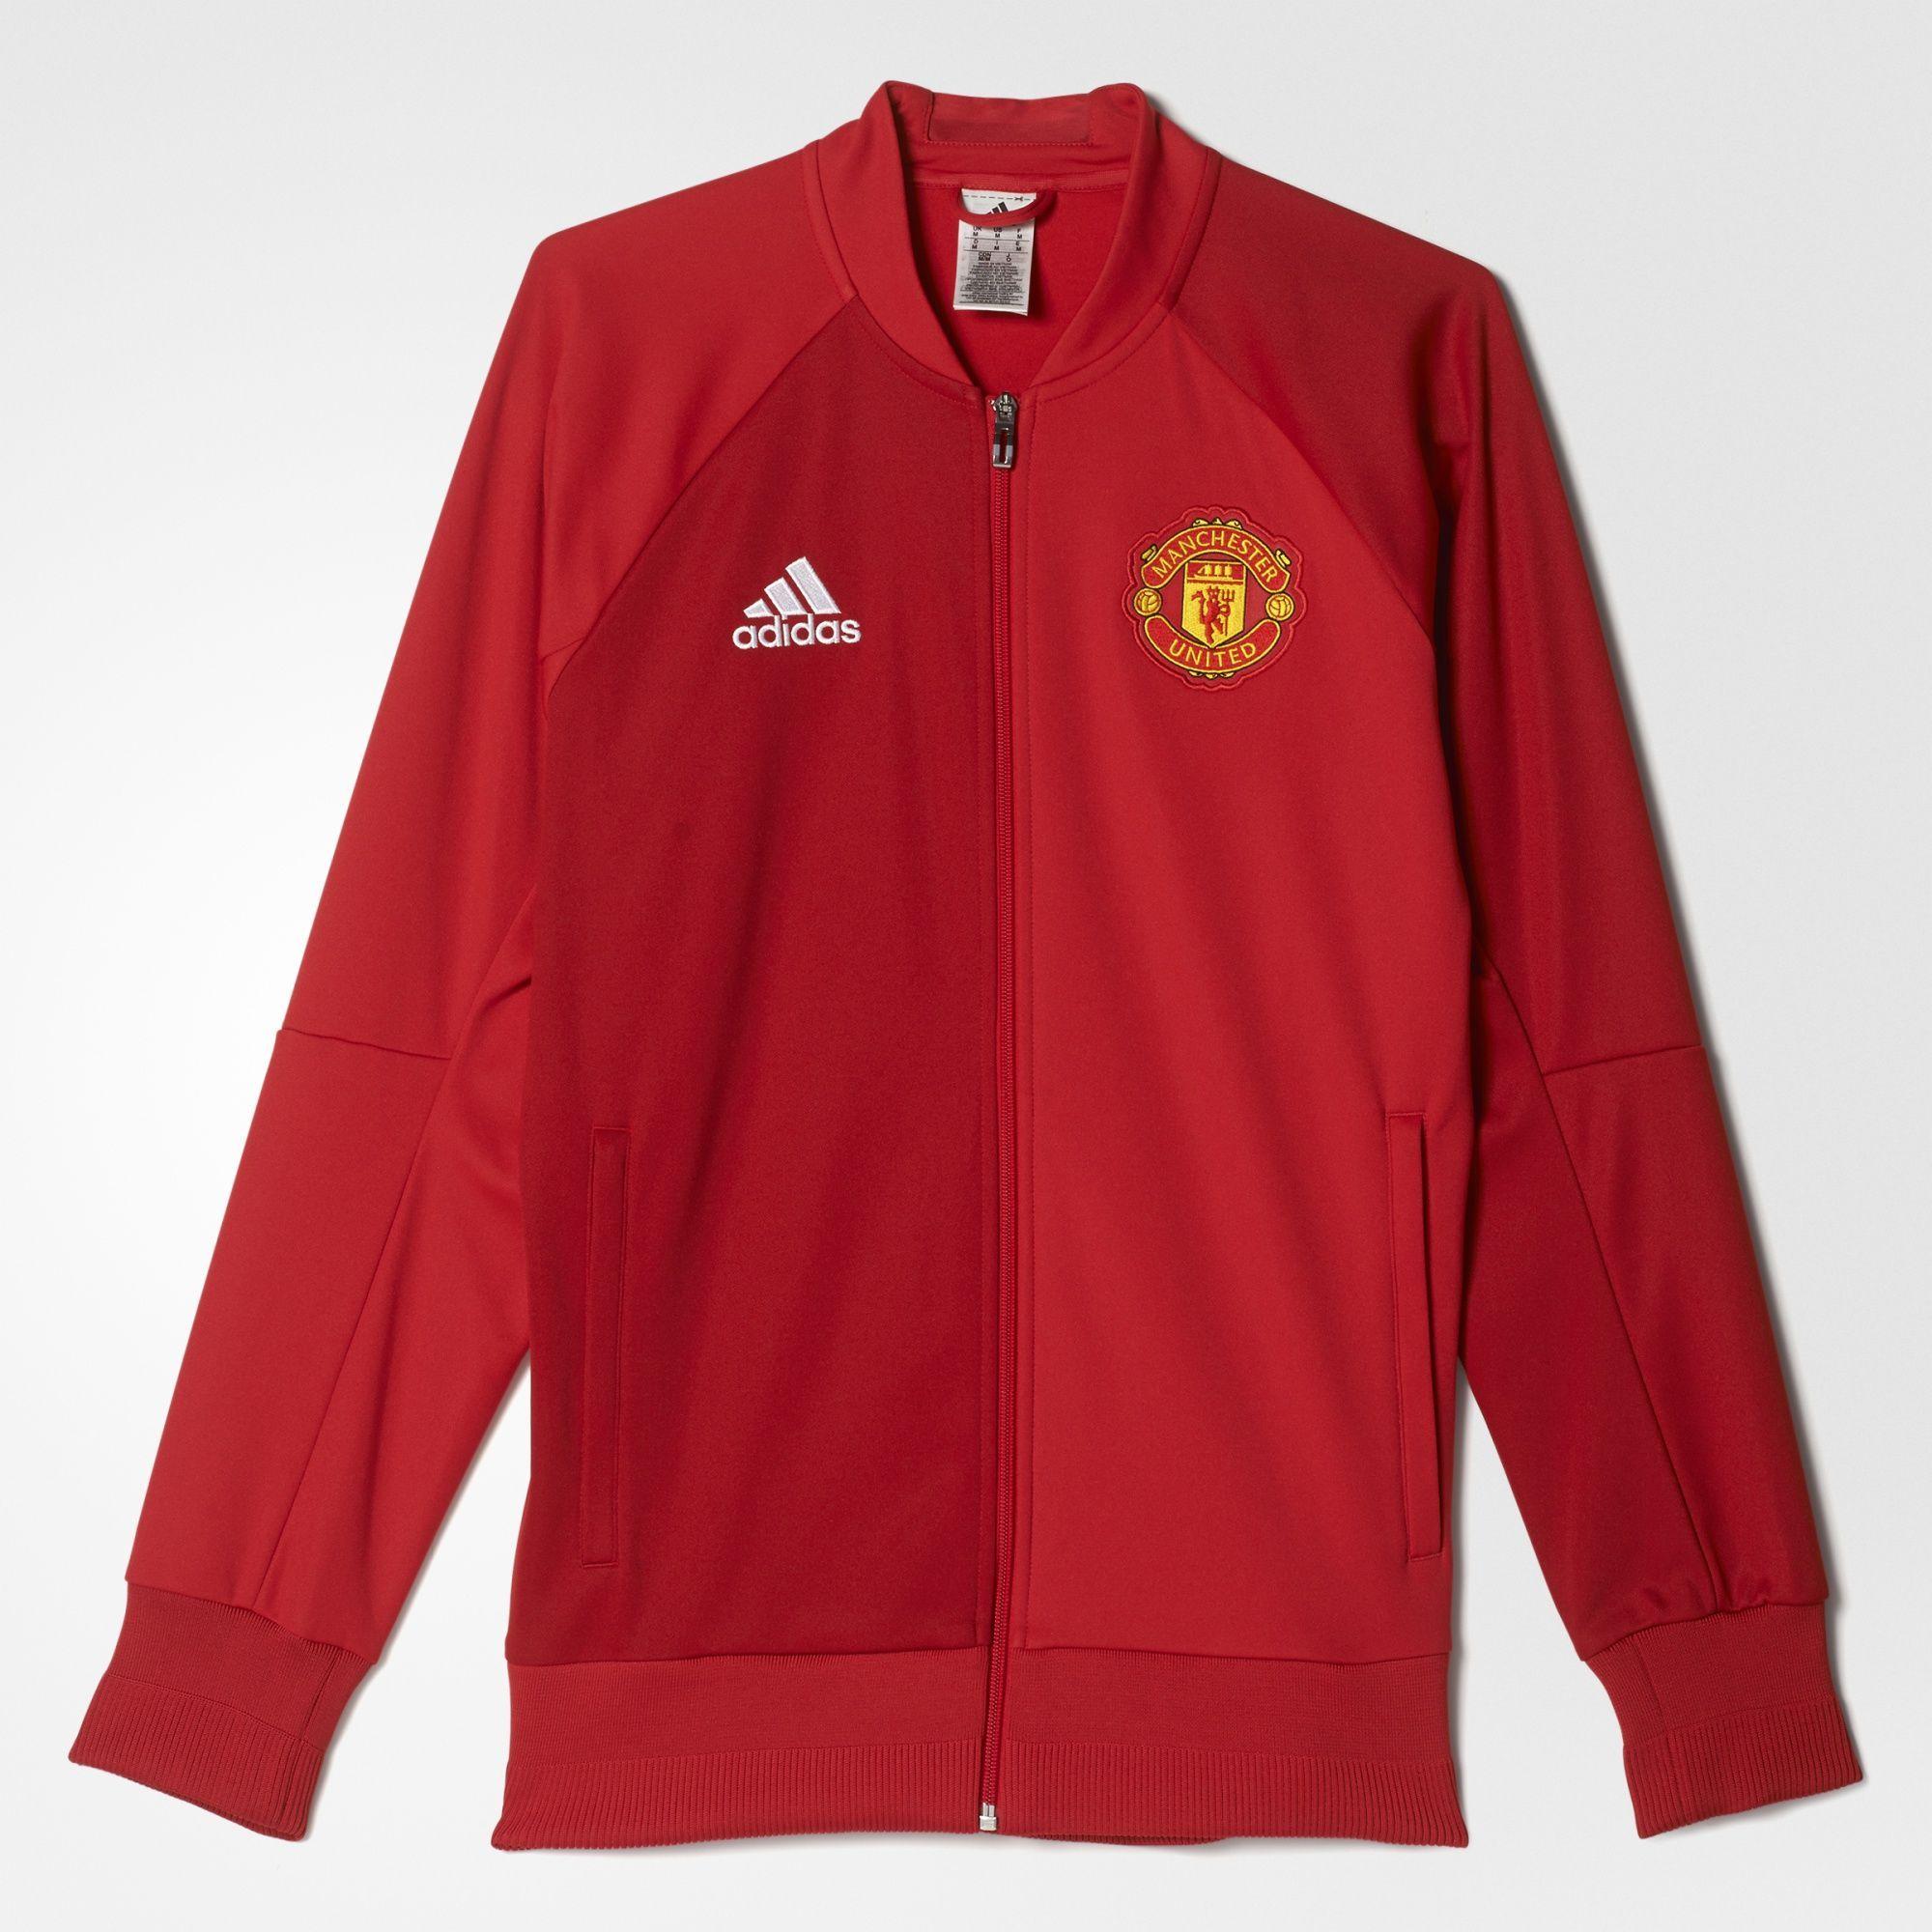 37b4ab3a2a9f5 adidas - Chaqueta Himno primera equipación Manchester United FC ...